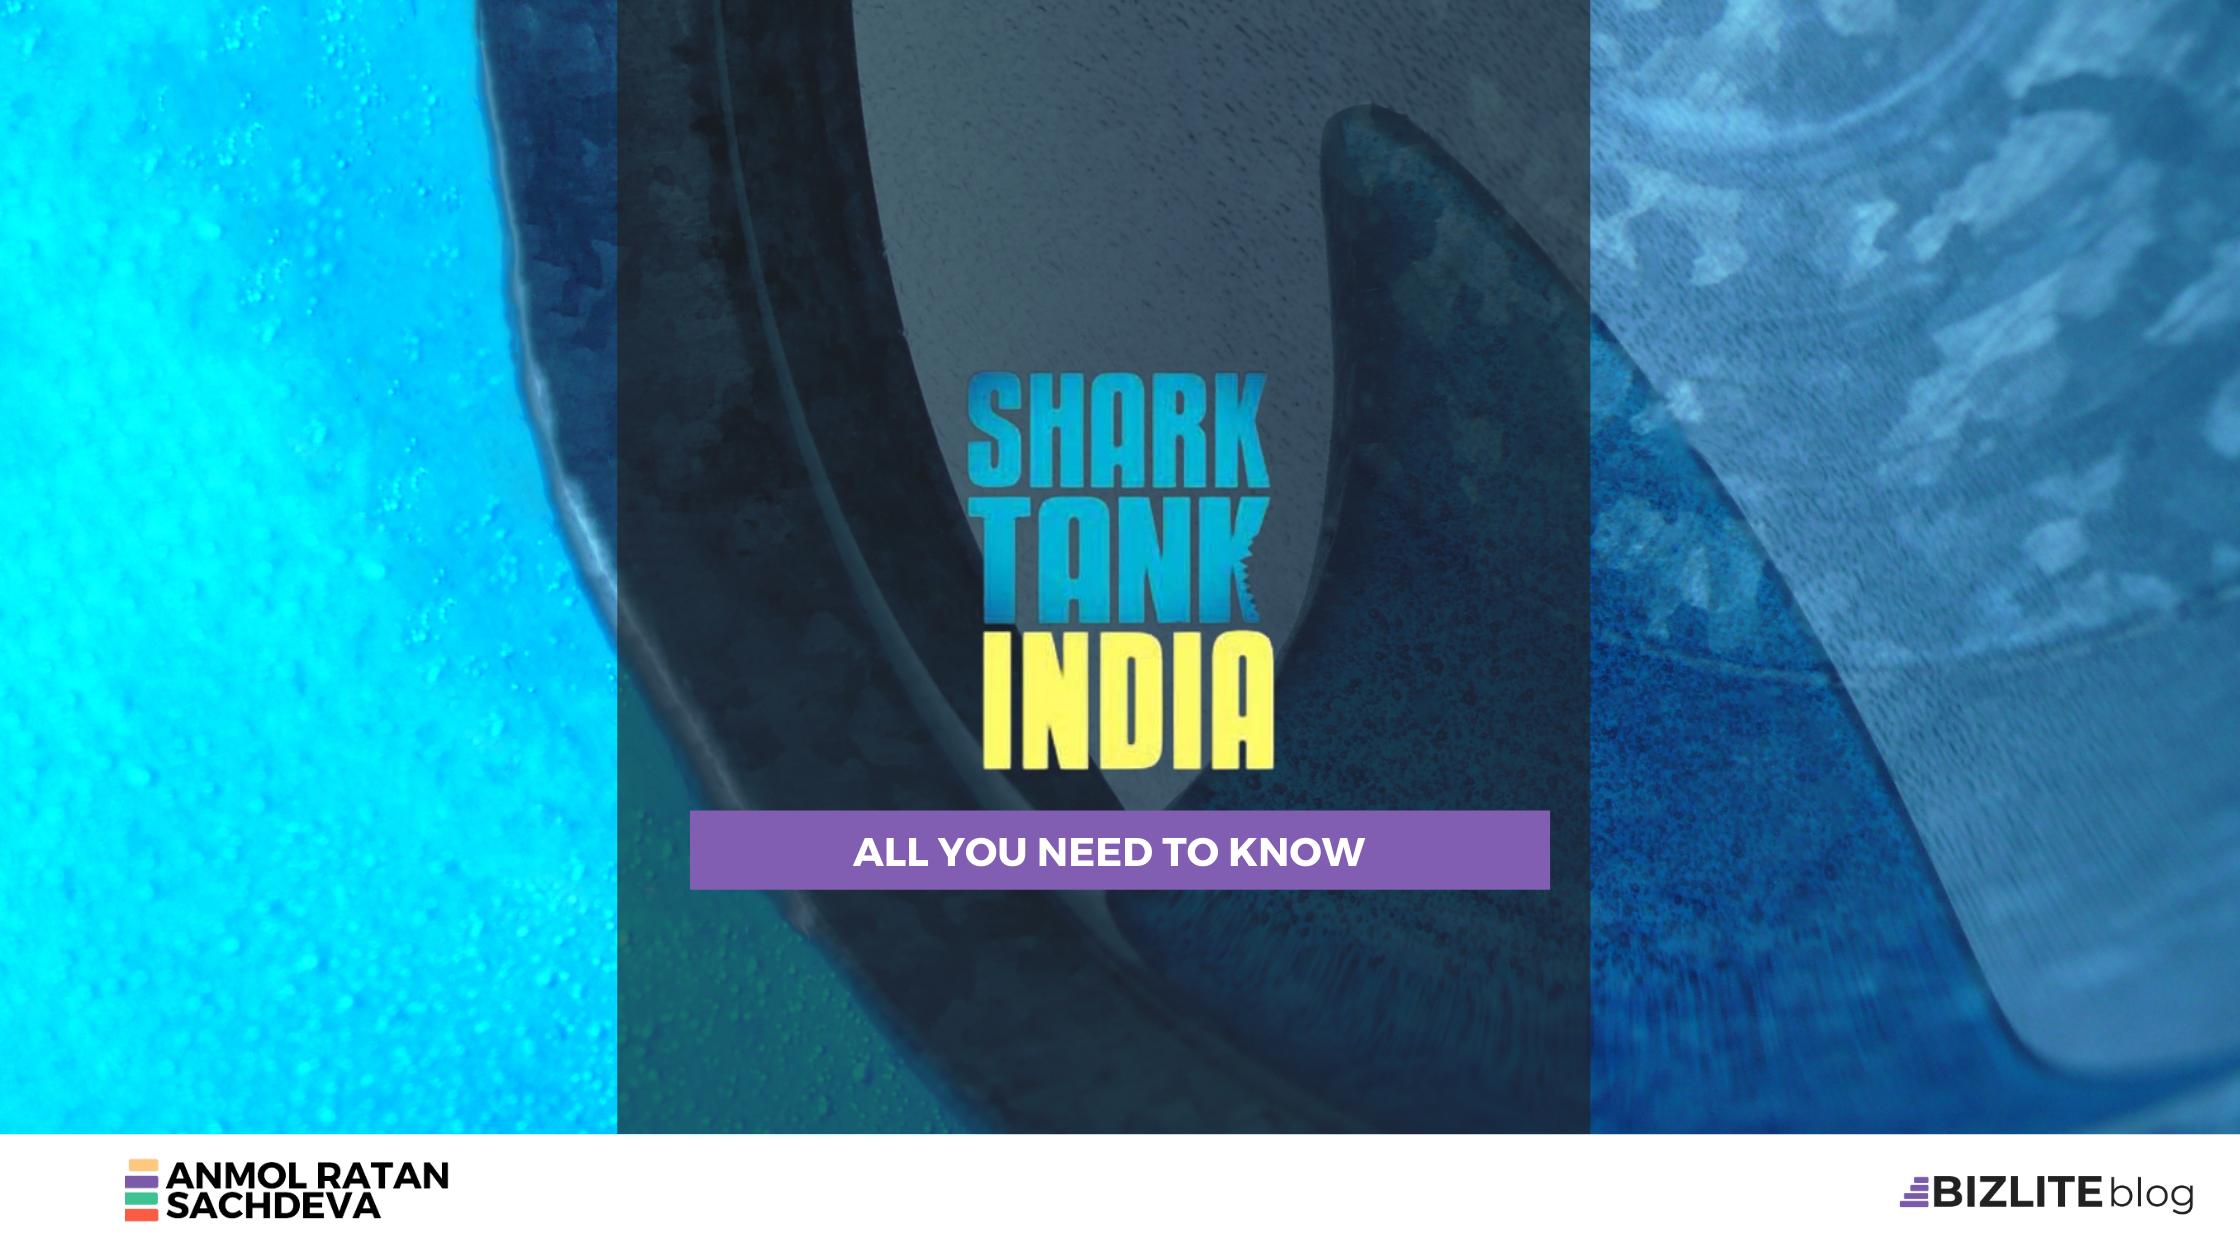 shark-tank-india-bizlite-blog